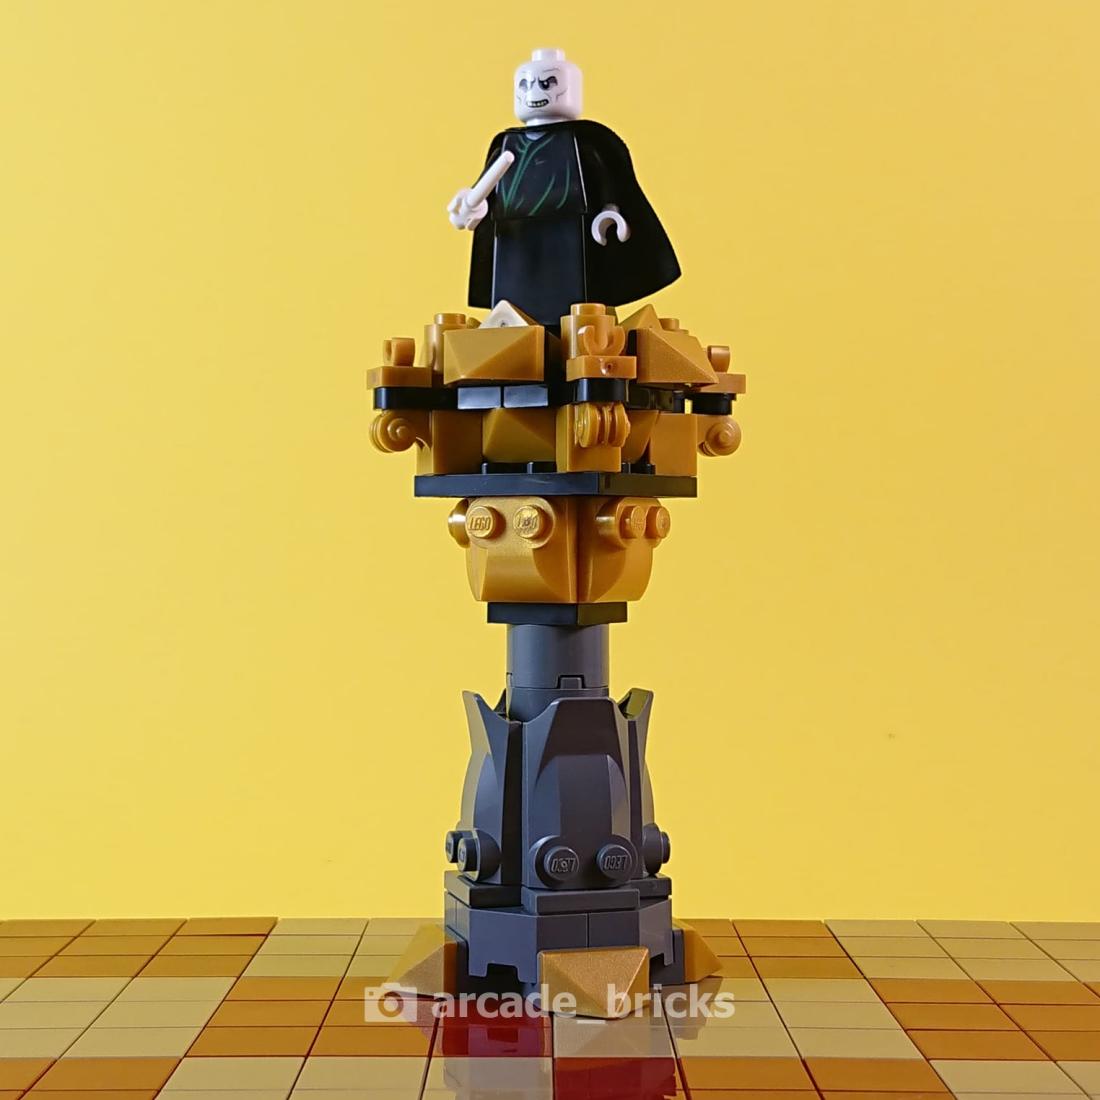 arcade_bricks_chess_evil_01_king